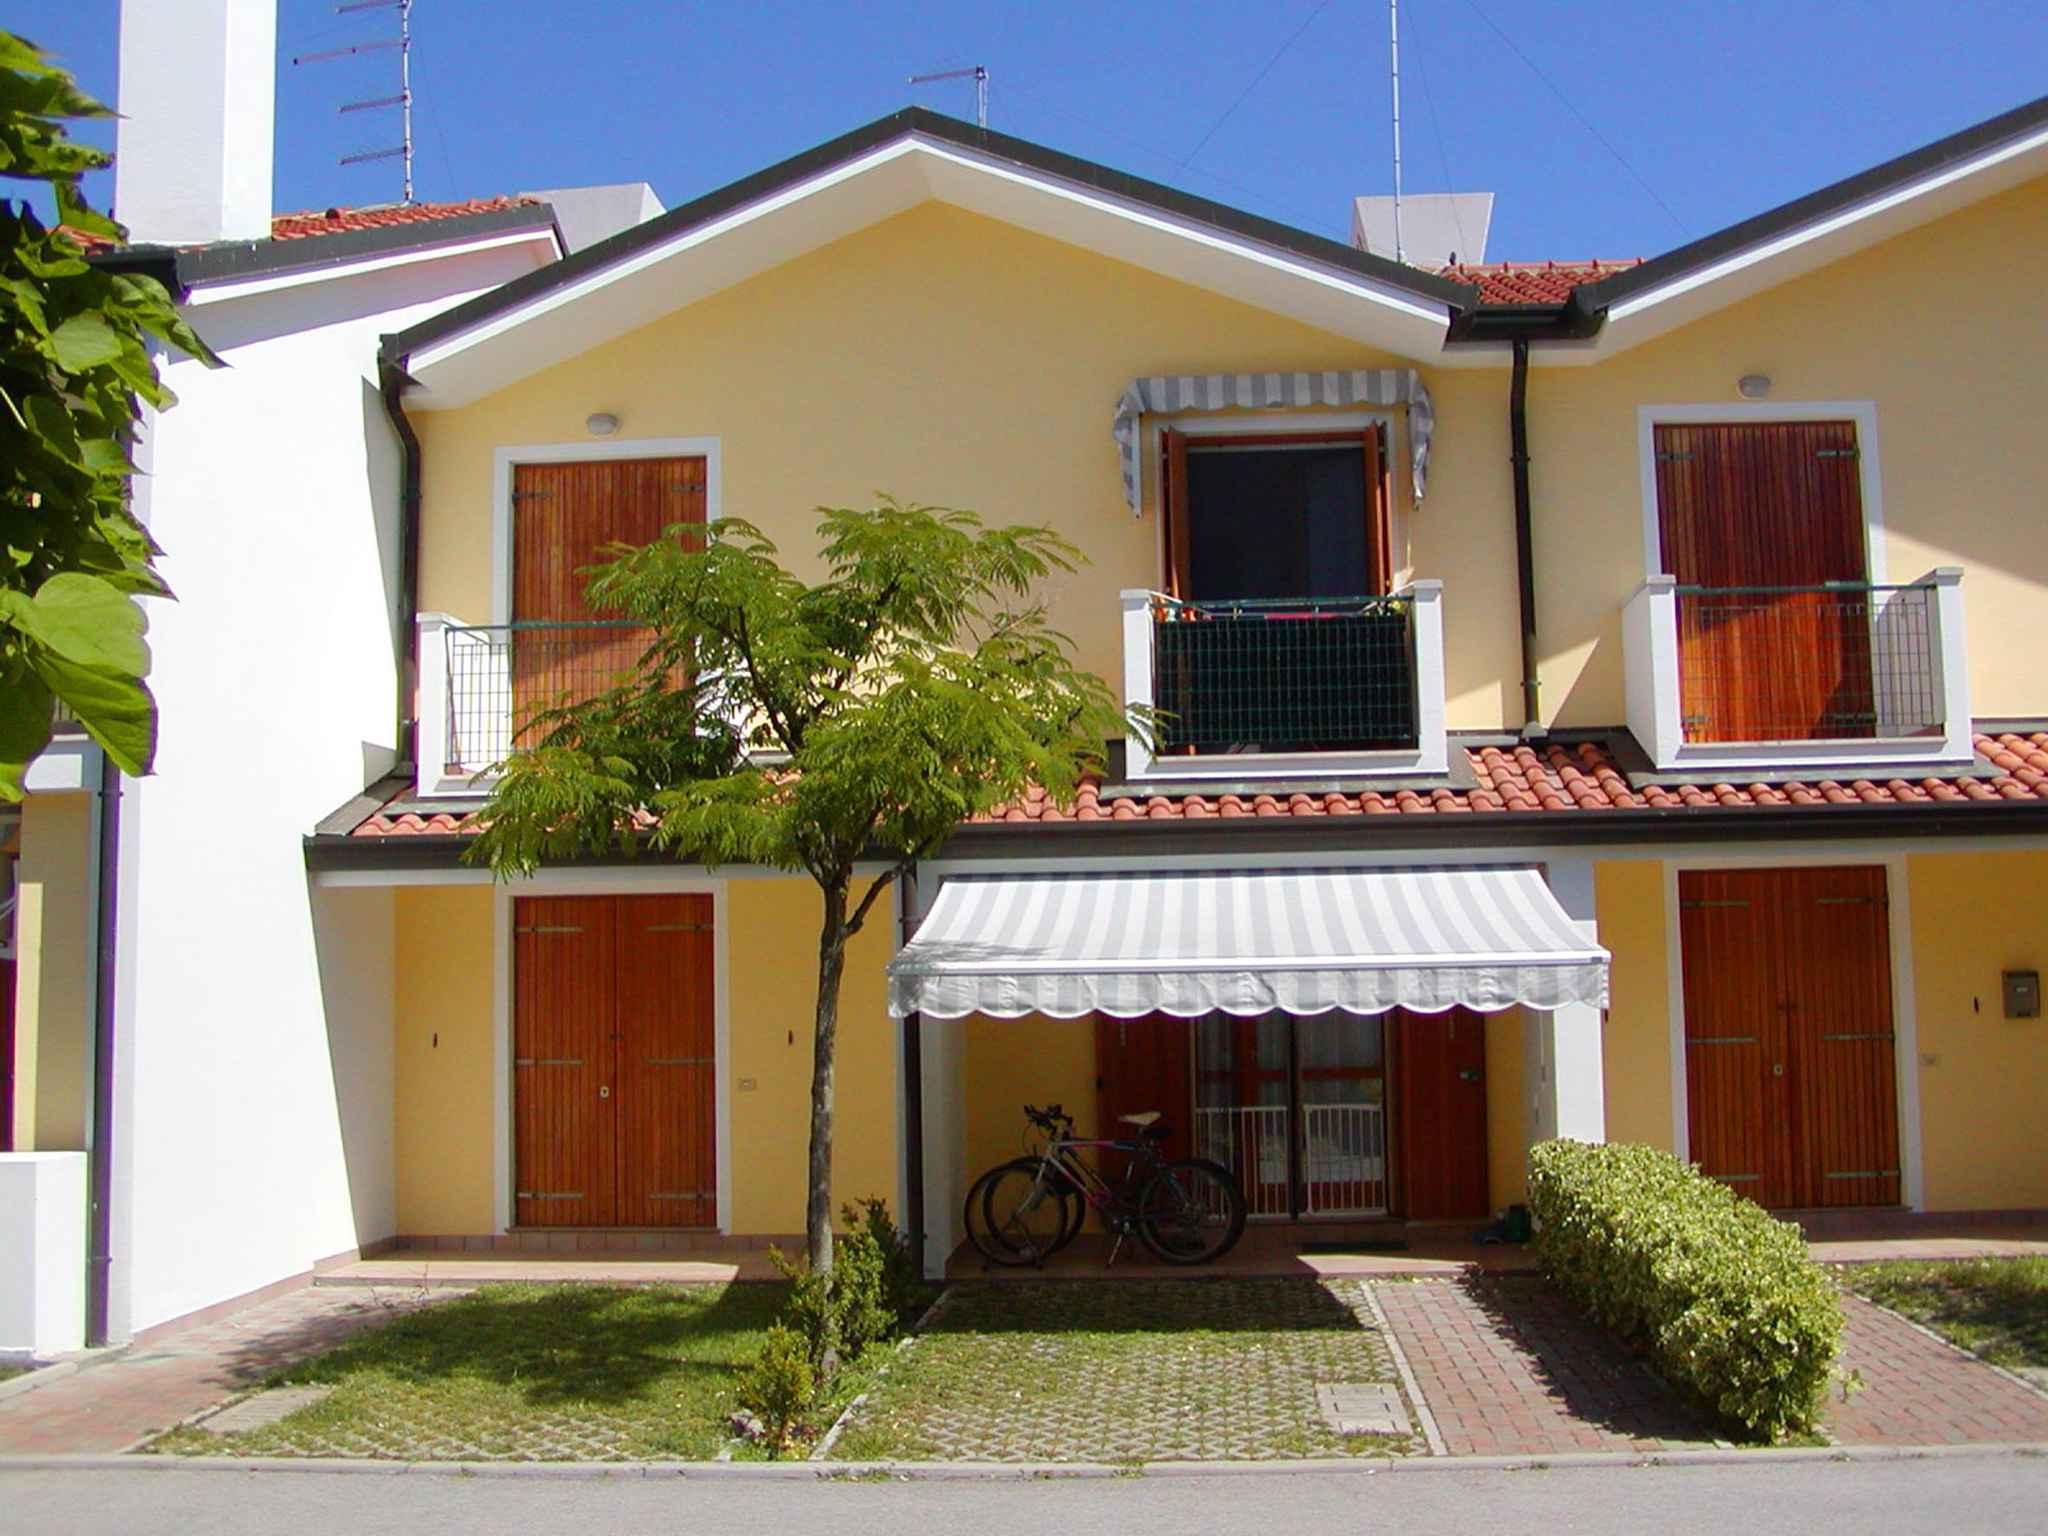 Ferienhaus mit Pool und Grill (284304), Rosolina Mare, Rovigo, Venetien, Italien, Bild 3